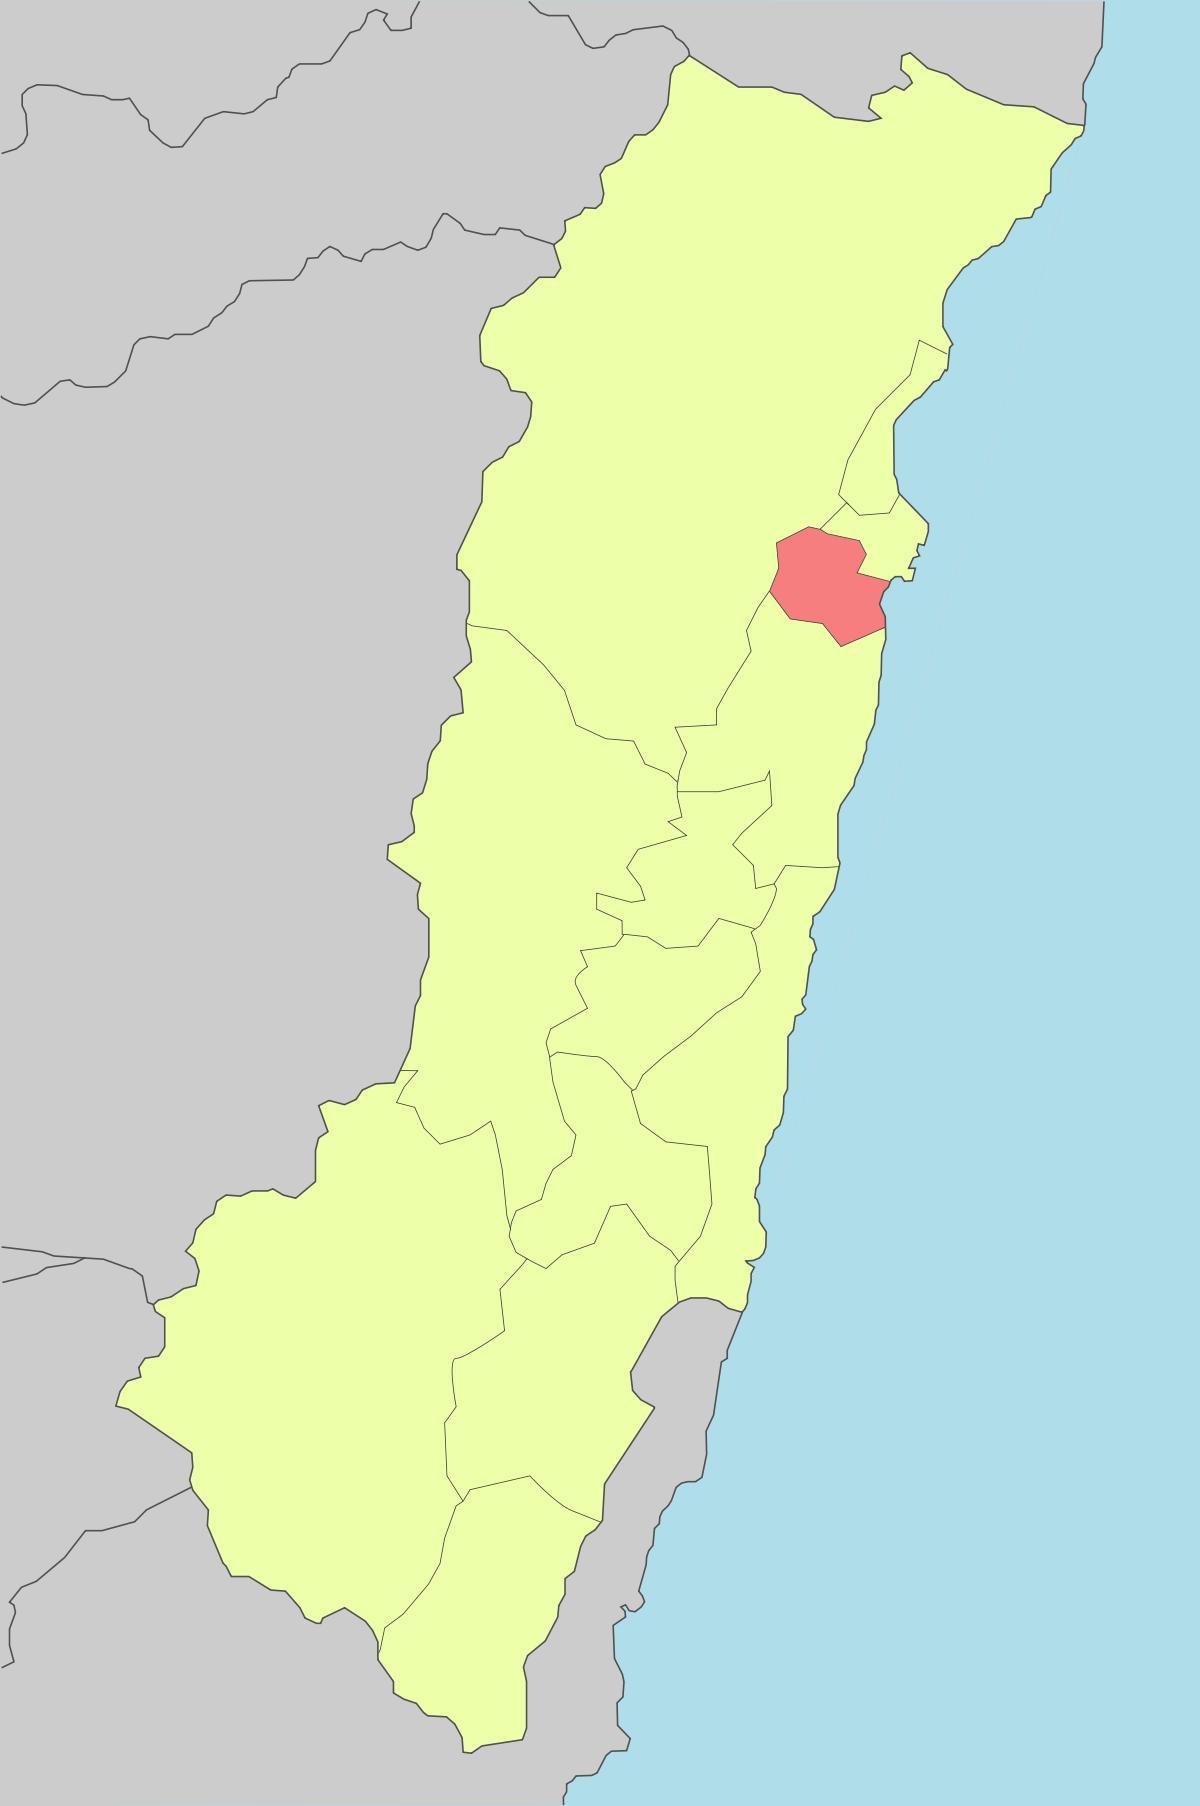 kart taiwan Hualien Taiwan kart   Kart over hualien Taiwan (Øst Asia   Asia) kart taiwan